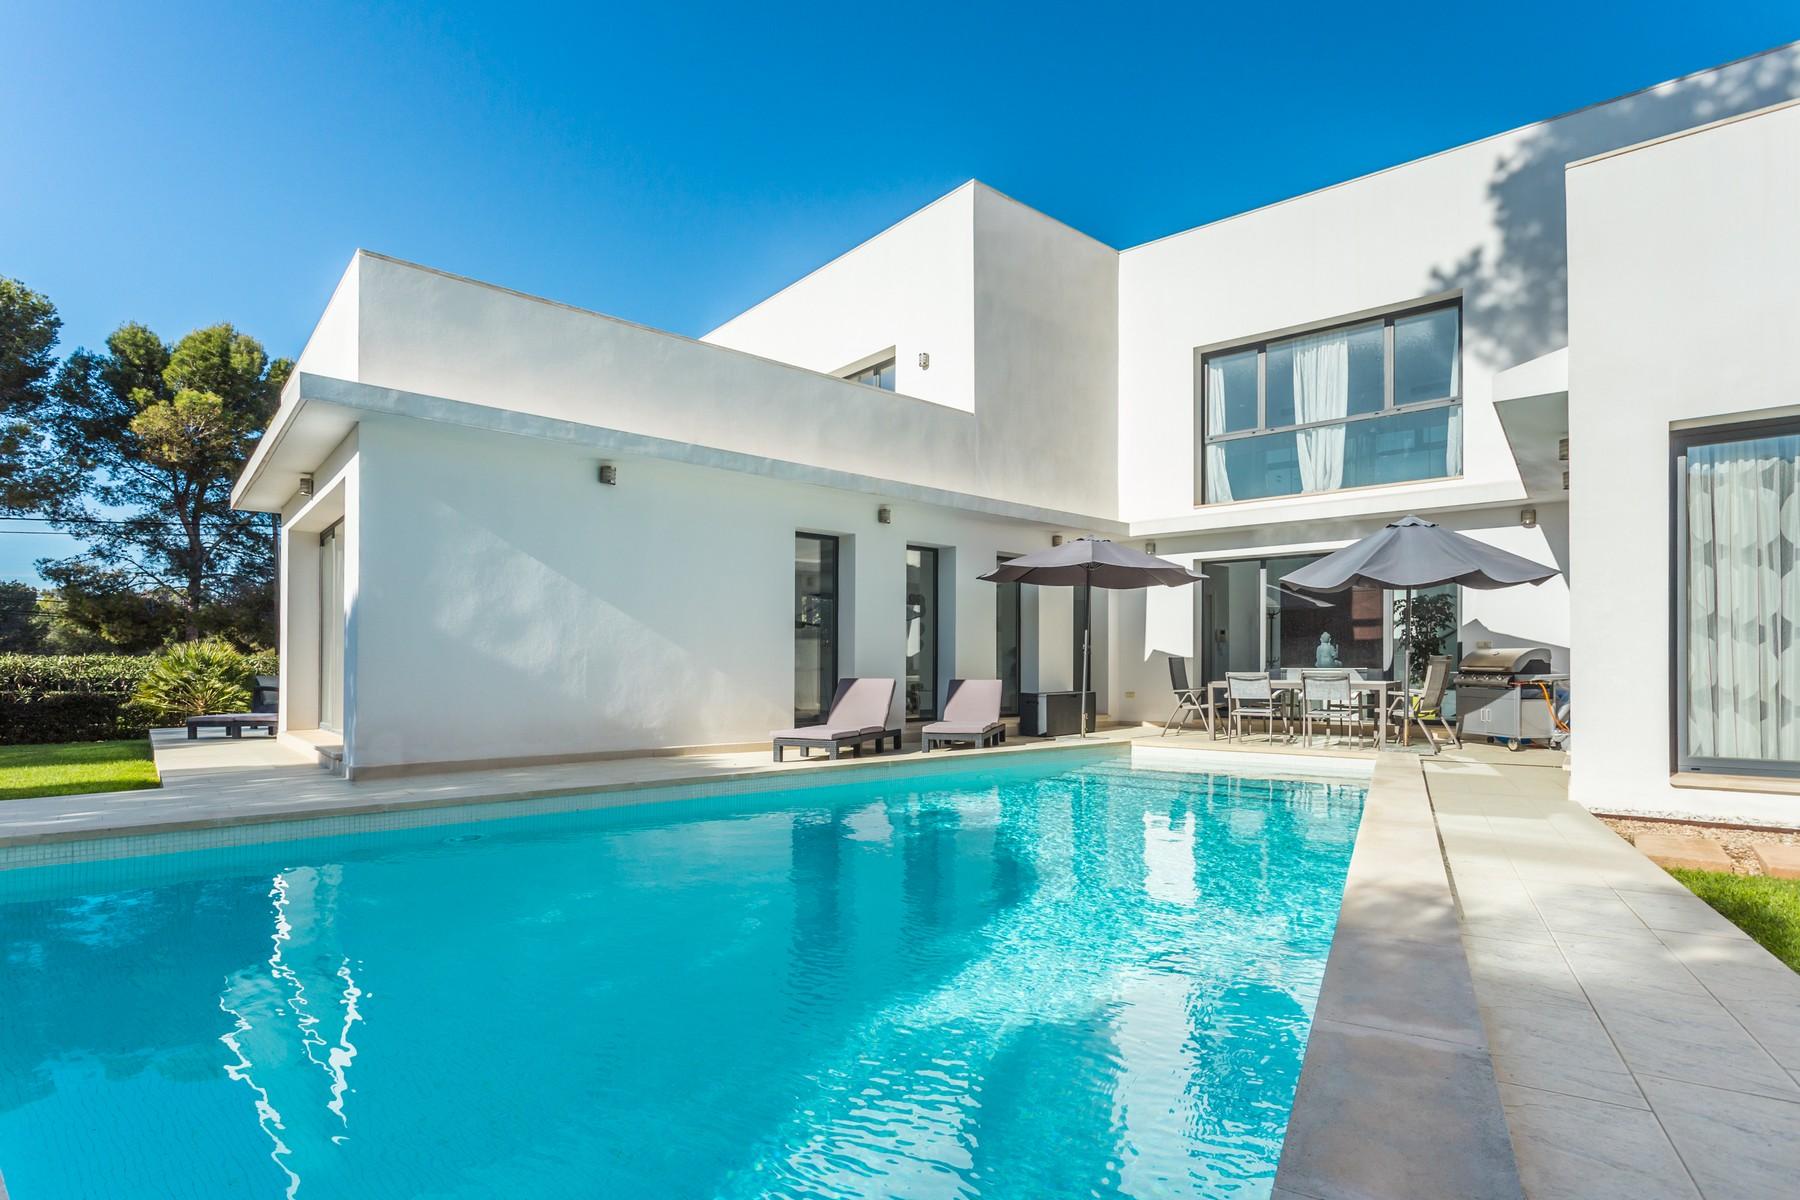 Villa per Vendita alle ore Spacious villa close to the beach in Santa Ponsa Santa Ponsa, Maiorca, 07181 Spagna